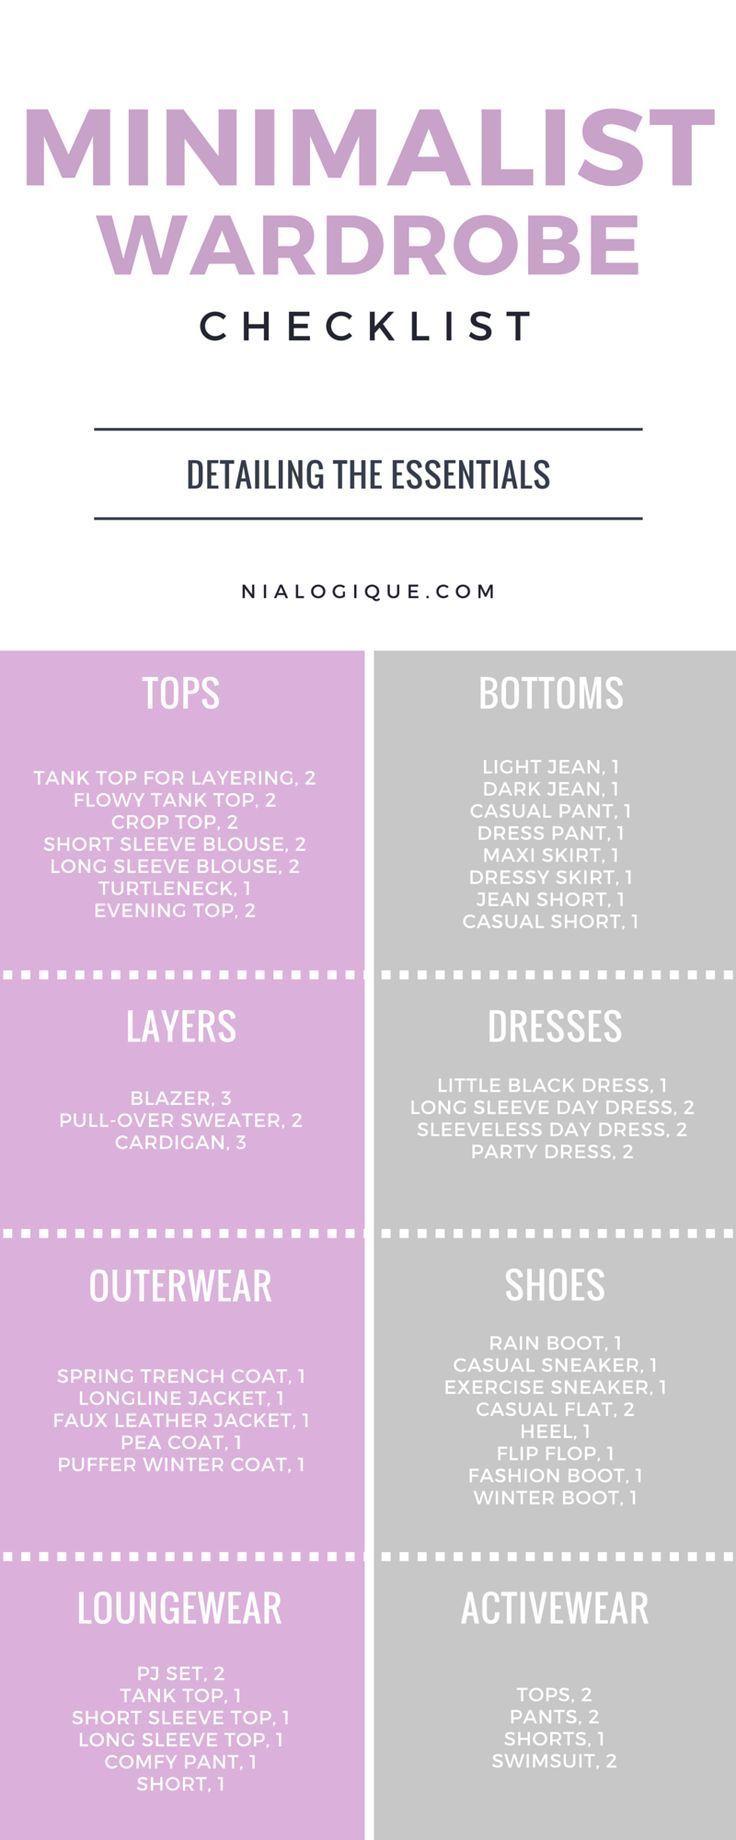 A simple, straightforward minimalist wardrobe checklist infographic to build a s…